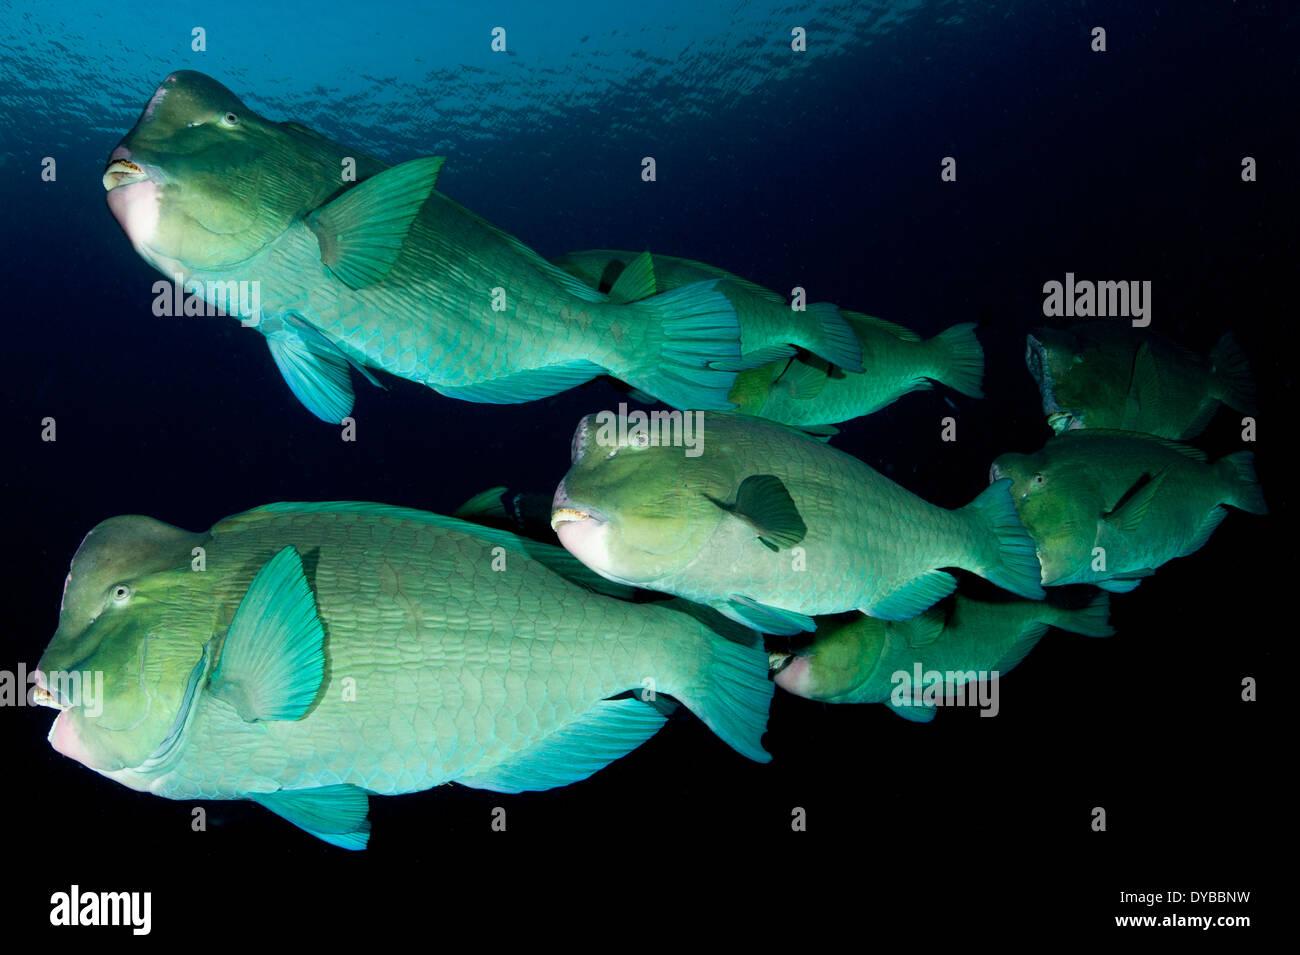 Large school of bumphead parrotfish (Bolbometopon muricatum), found around the Liberty Wreck, Bali, Indonesia. - Stock Image